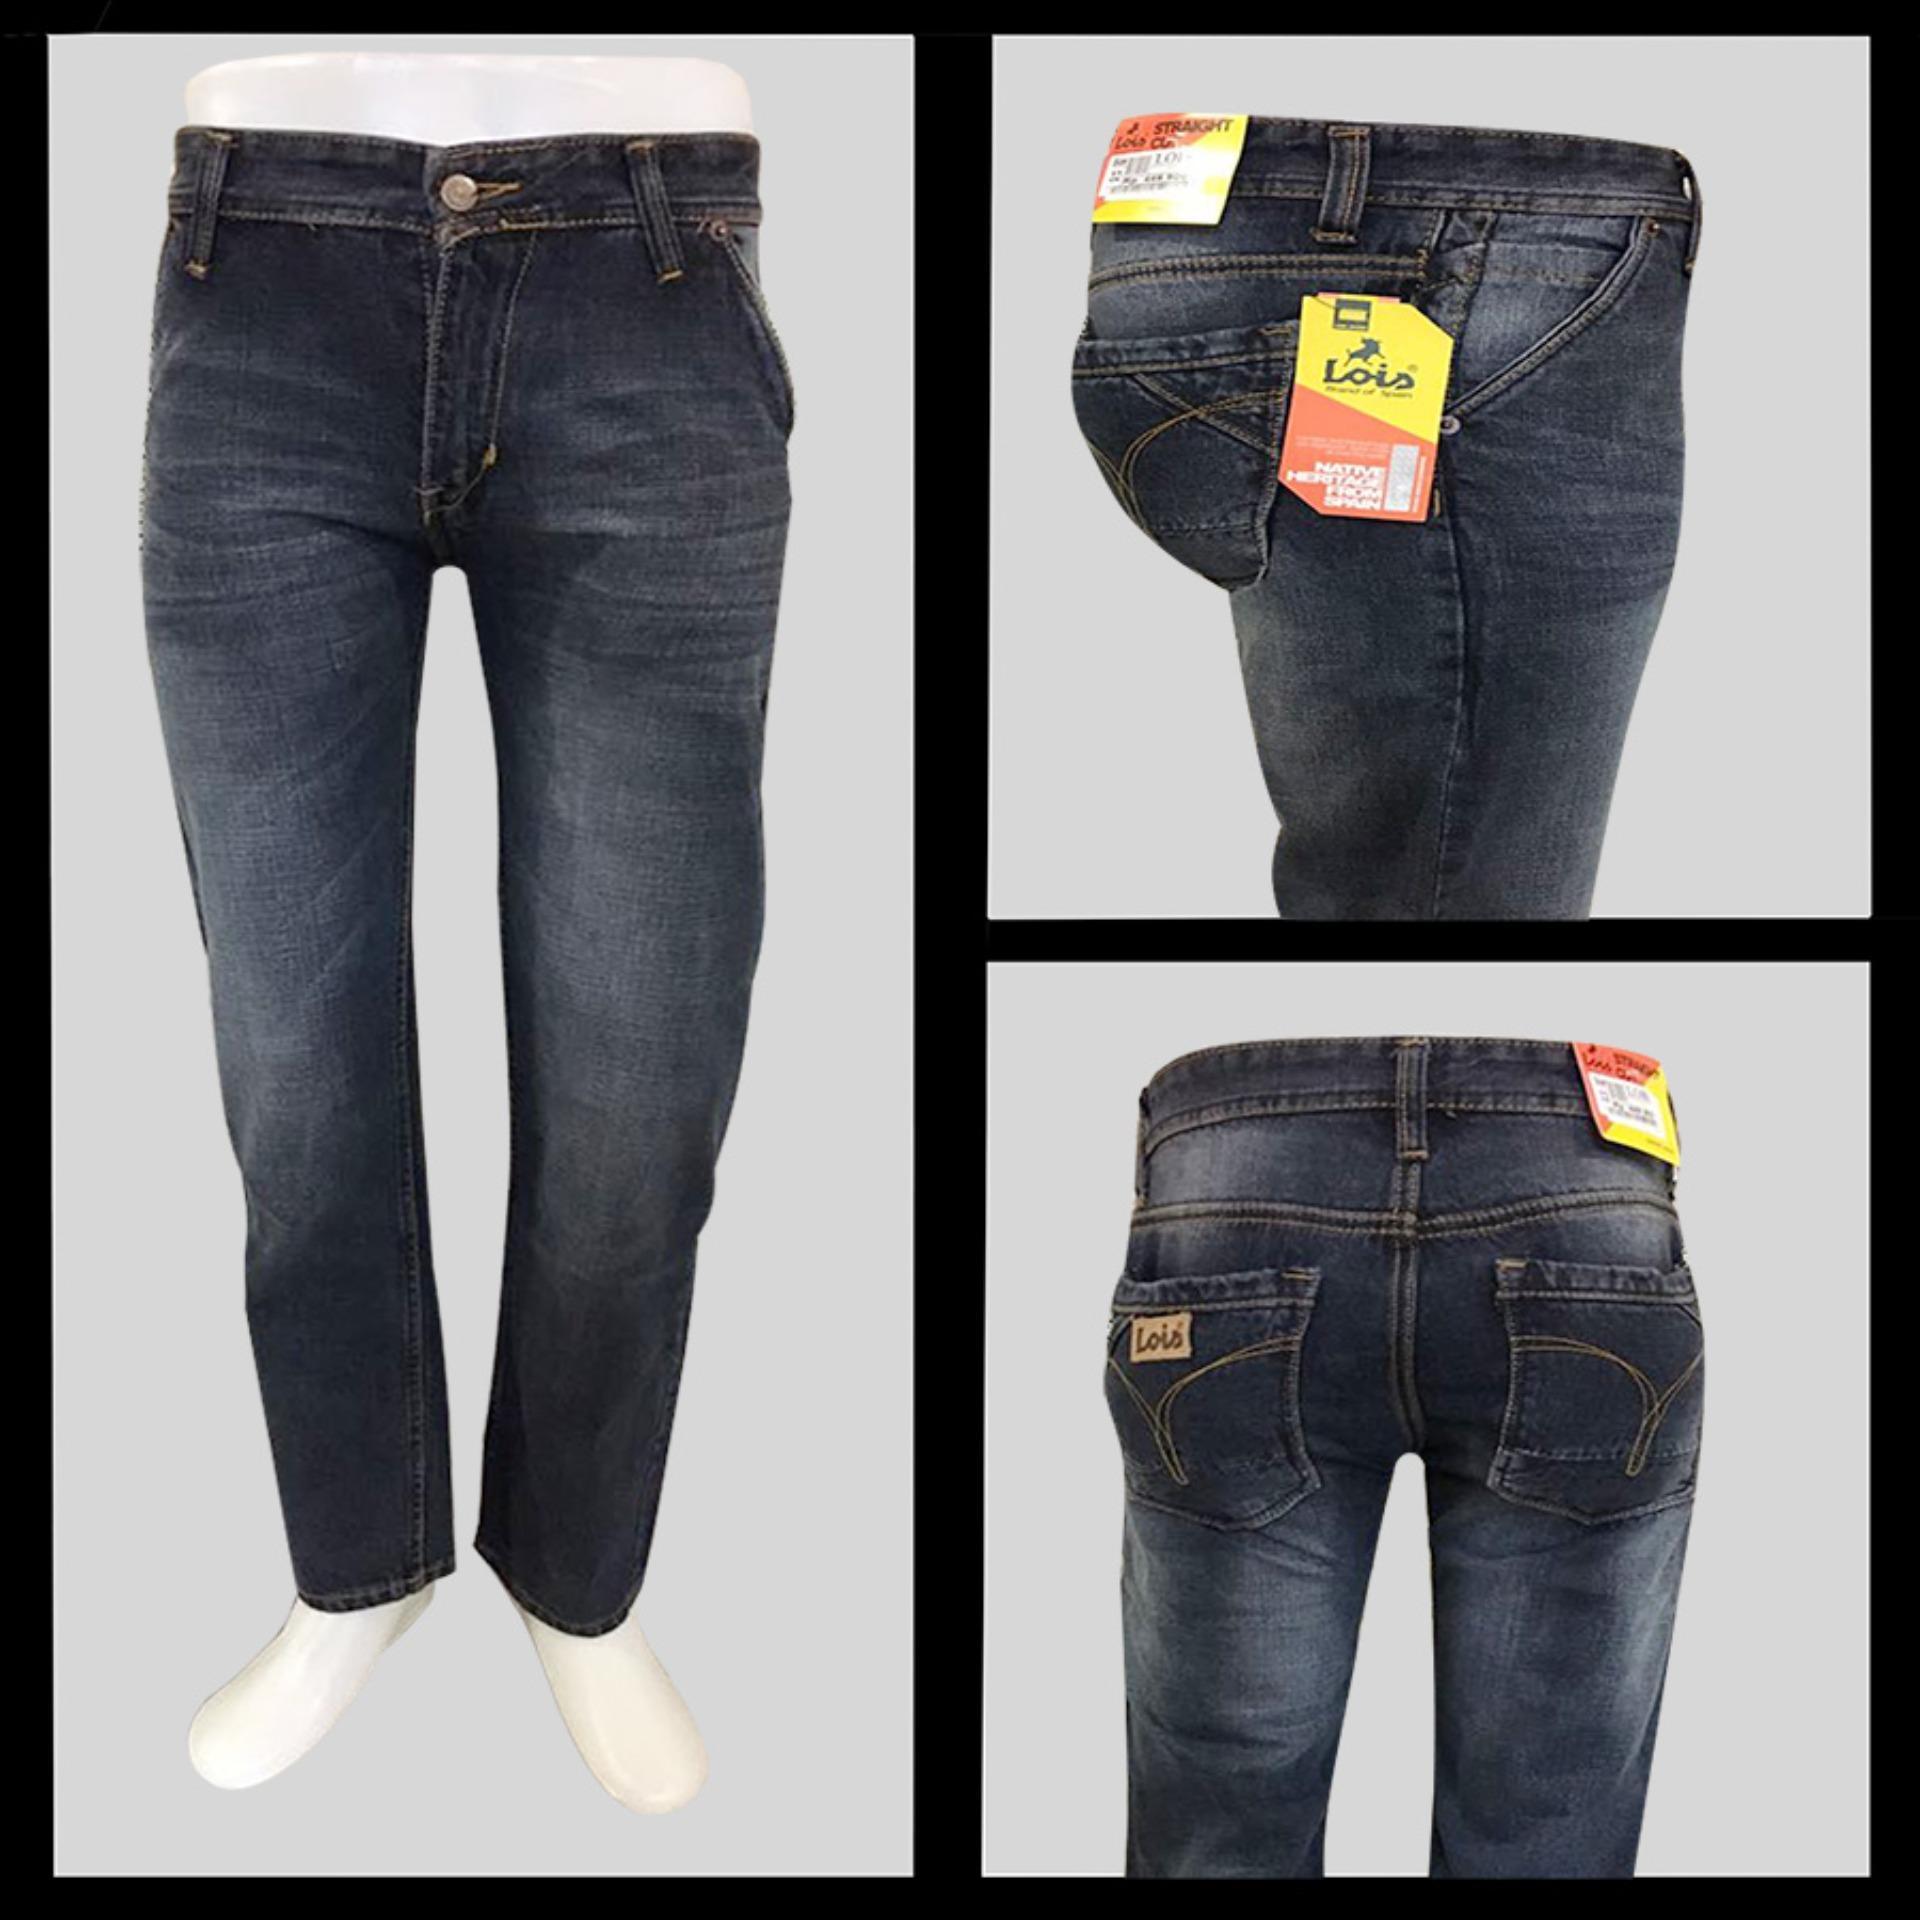 Cek Harga Baru 5766 Skinny Jeans Whisker Grey Wash Stretch Celana Panjang Street Pria Model